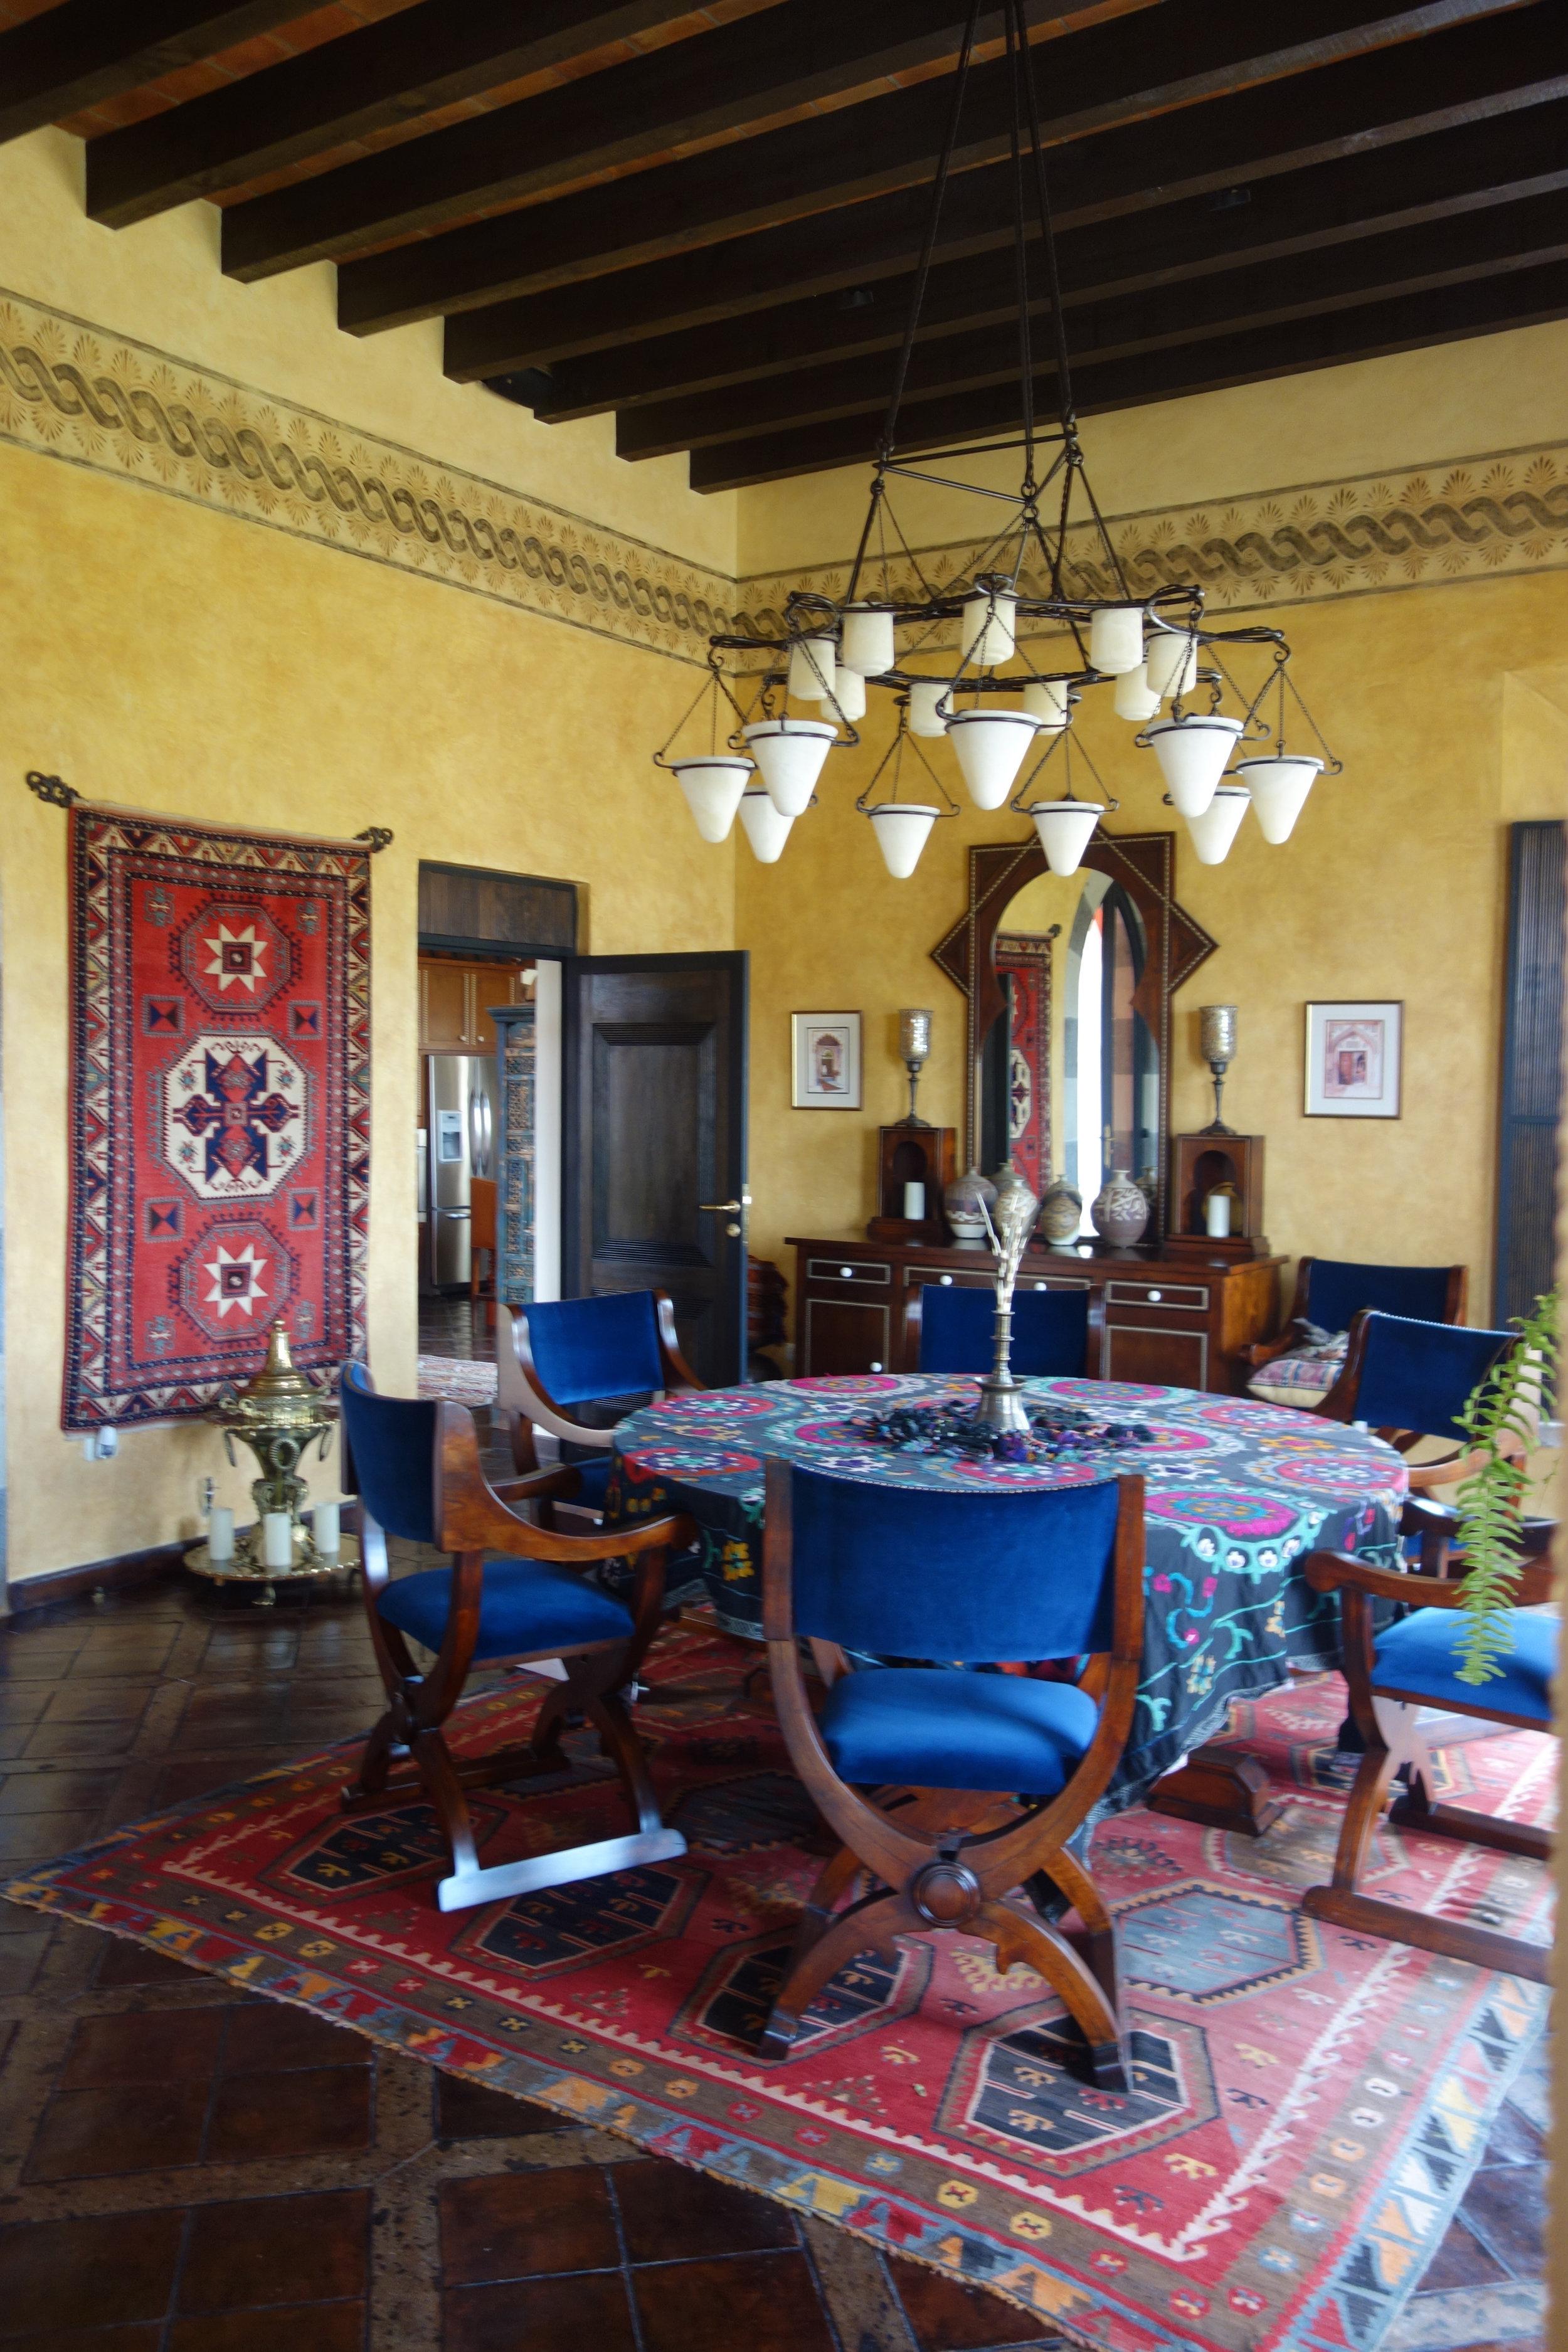 CASA OASIS, DINING ROOM